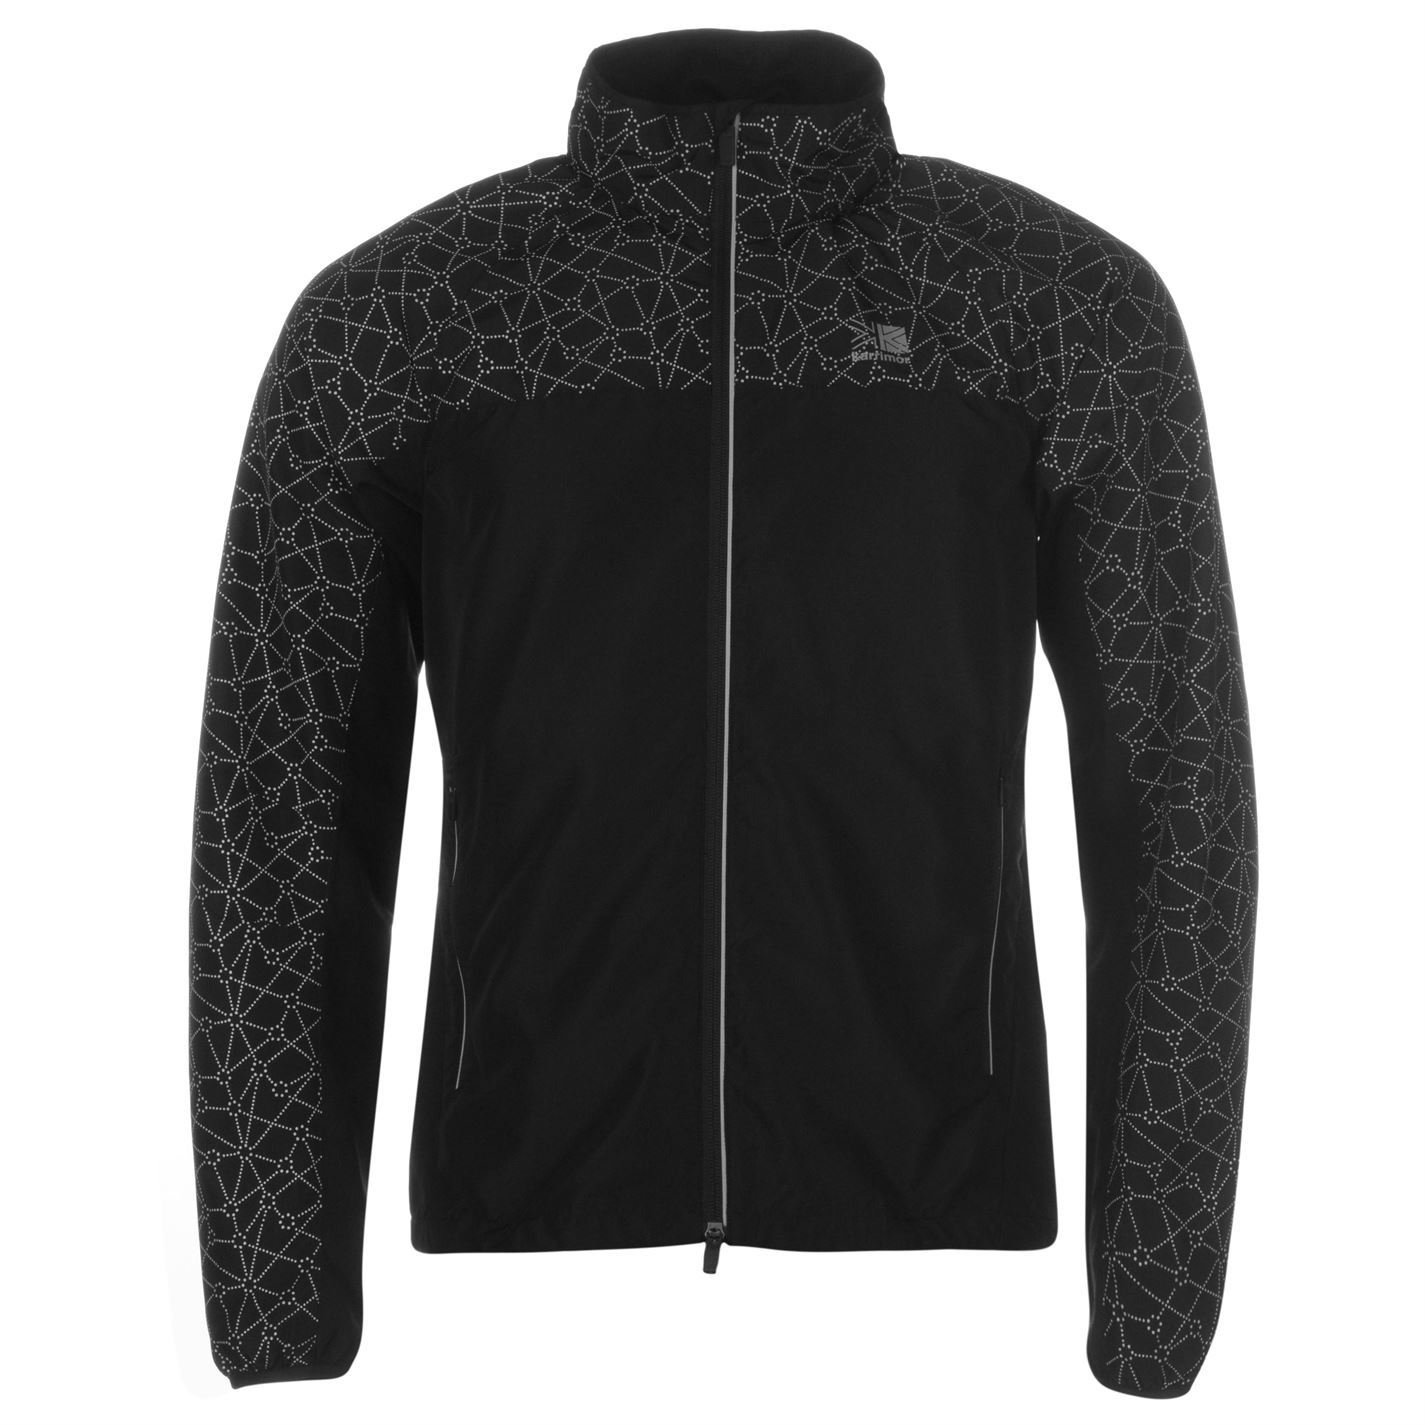 59e150f2a Karrimor Mens Xlite Reflective Running Jacket Coat Top Chin Guard High Neck  Black/Reflect S: Amazon.co.uk: Clothing